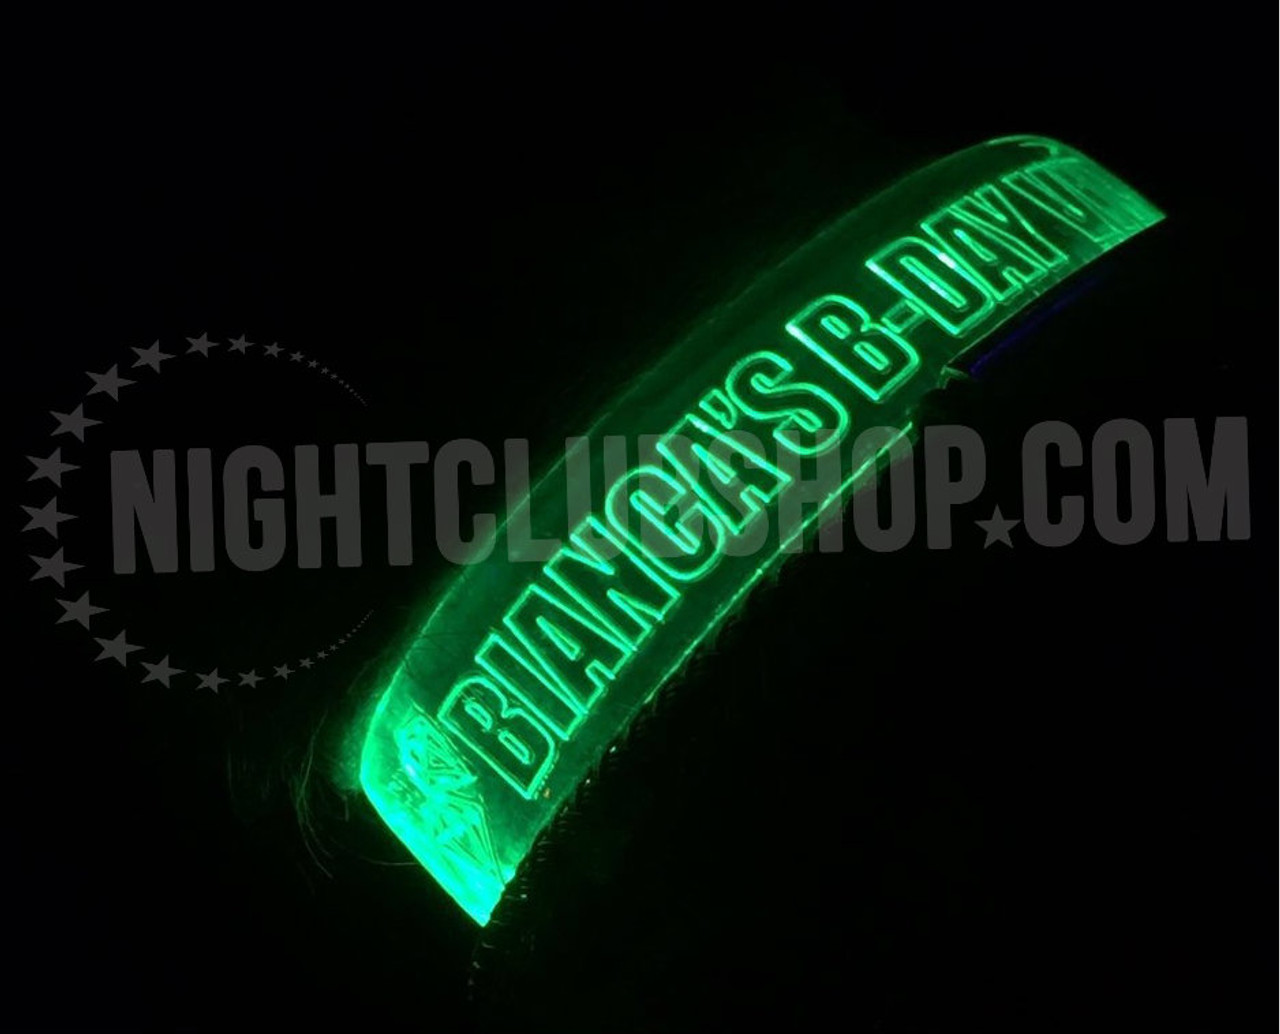 Custom,laser engraved,laser,engrave,LED,wrist band, wristband, wrist, band,bracelet,LED Bracelet, Party,wedding,Event,Trade show,give away, Logo,name,